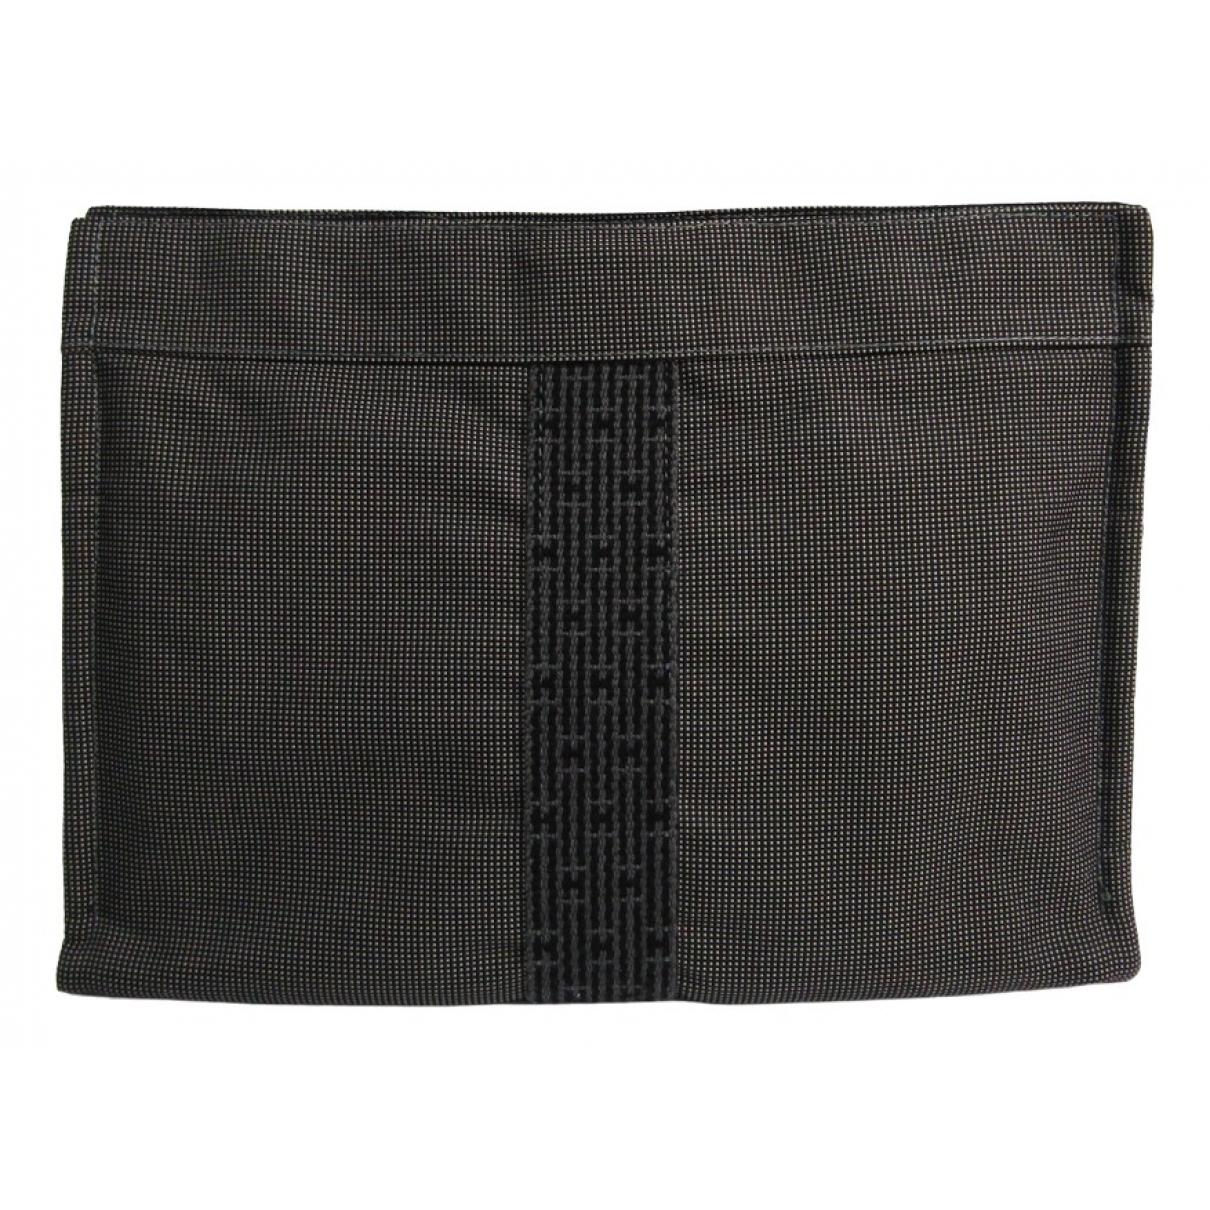 Hermès \N Black Cloth Clutch bag for Women \N